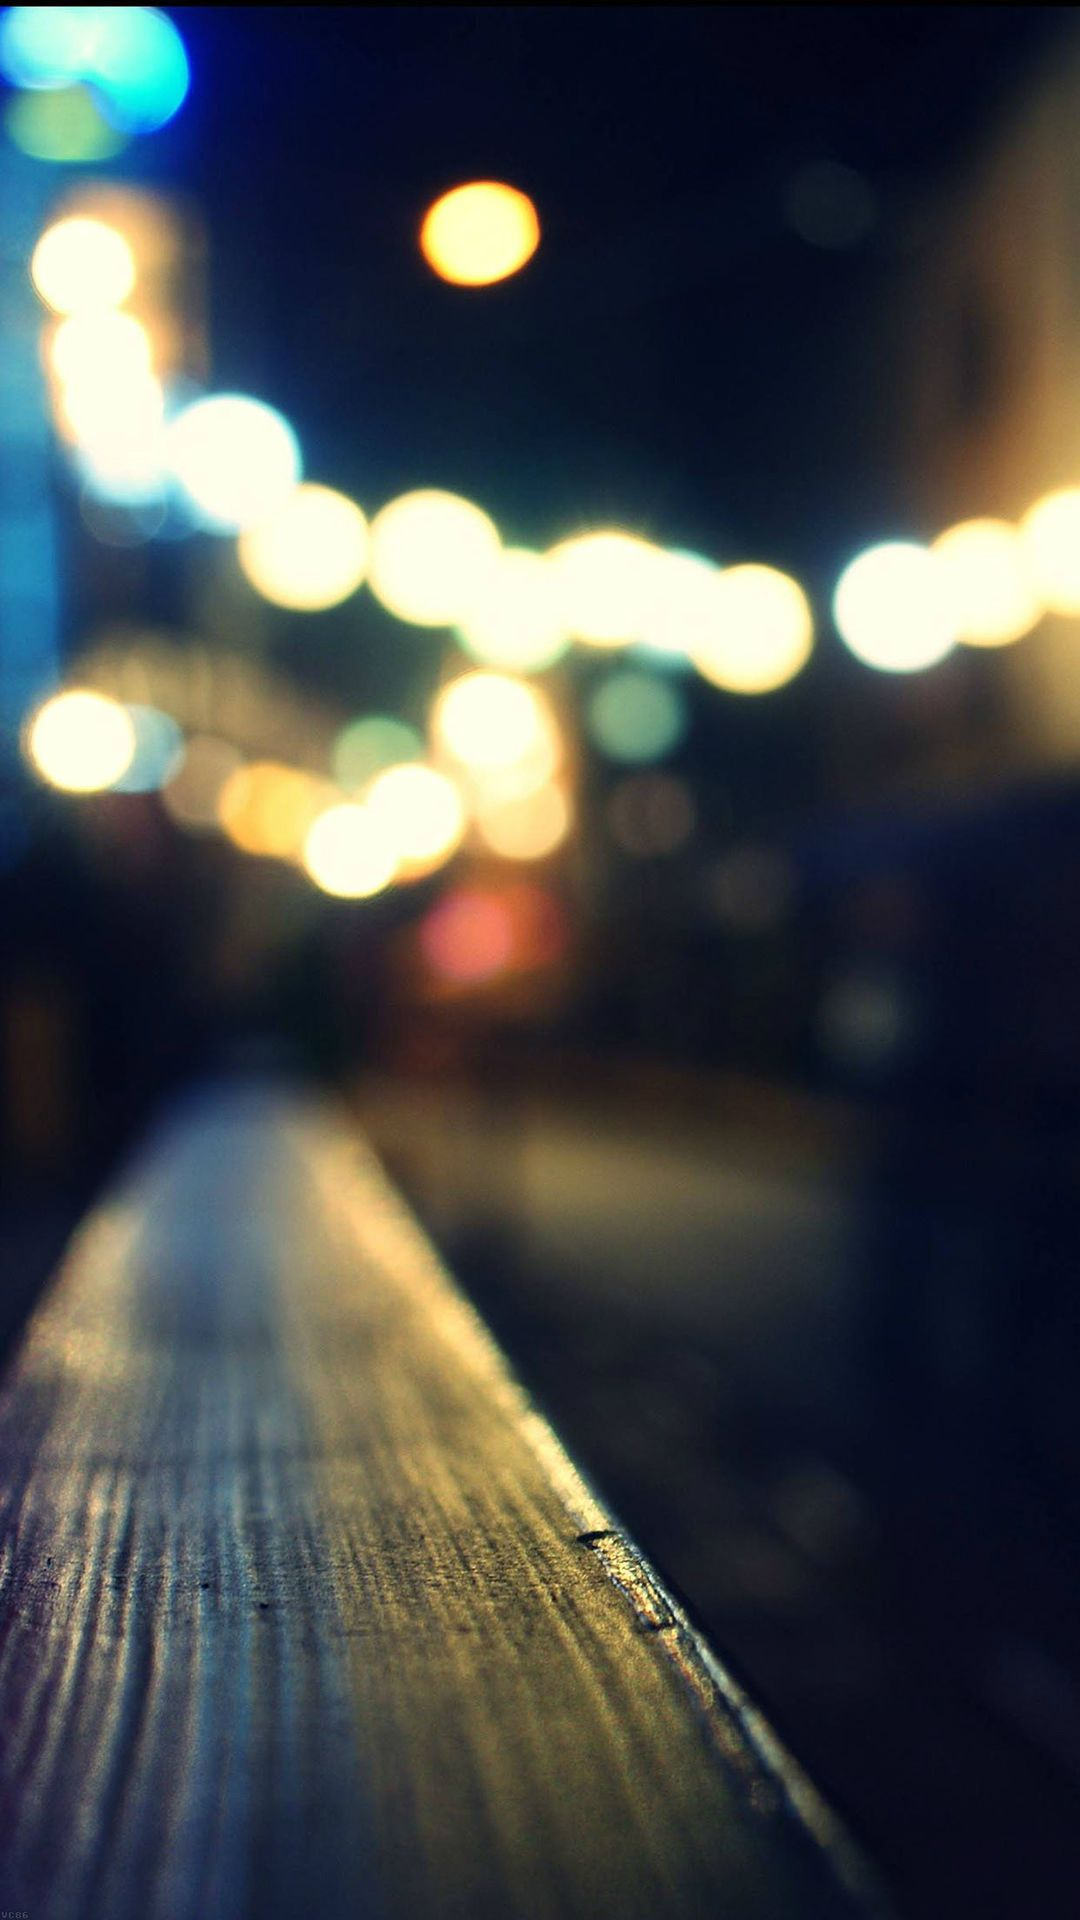 Bokeh Night City Neon Light iPhone 6 plus wallpaper